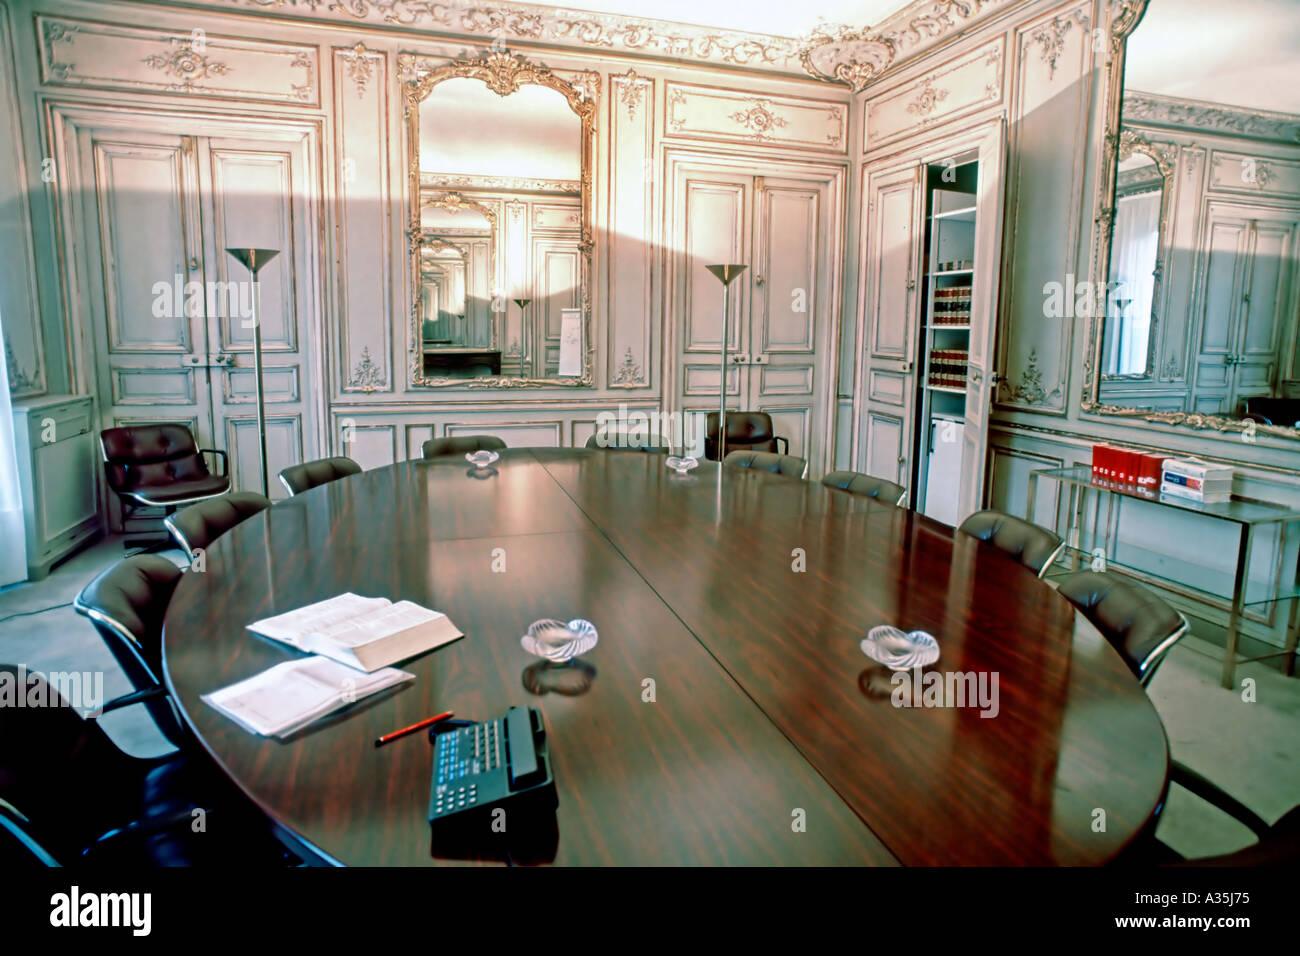 Office interior paris france la salle de conférence au bureau d